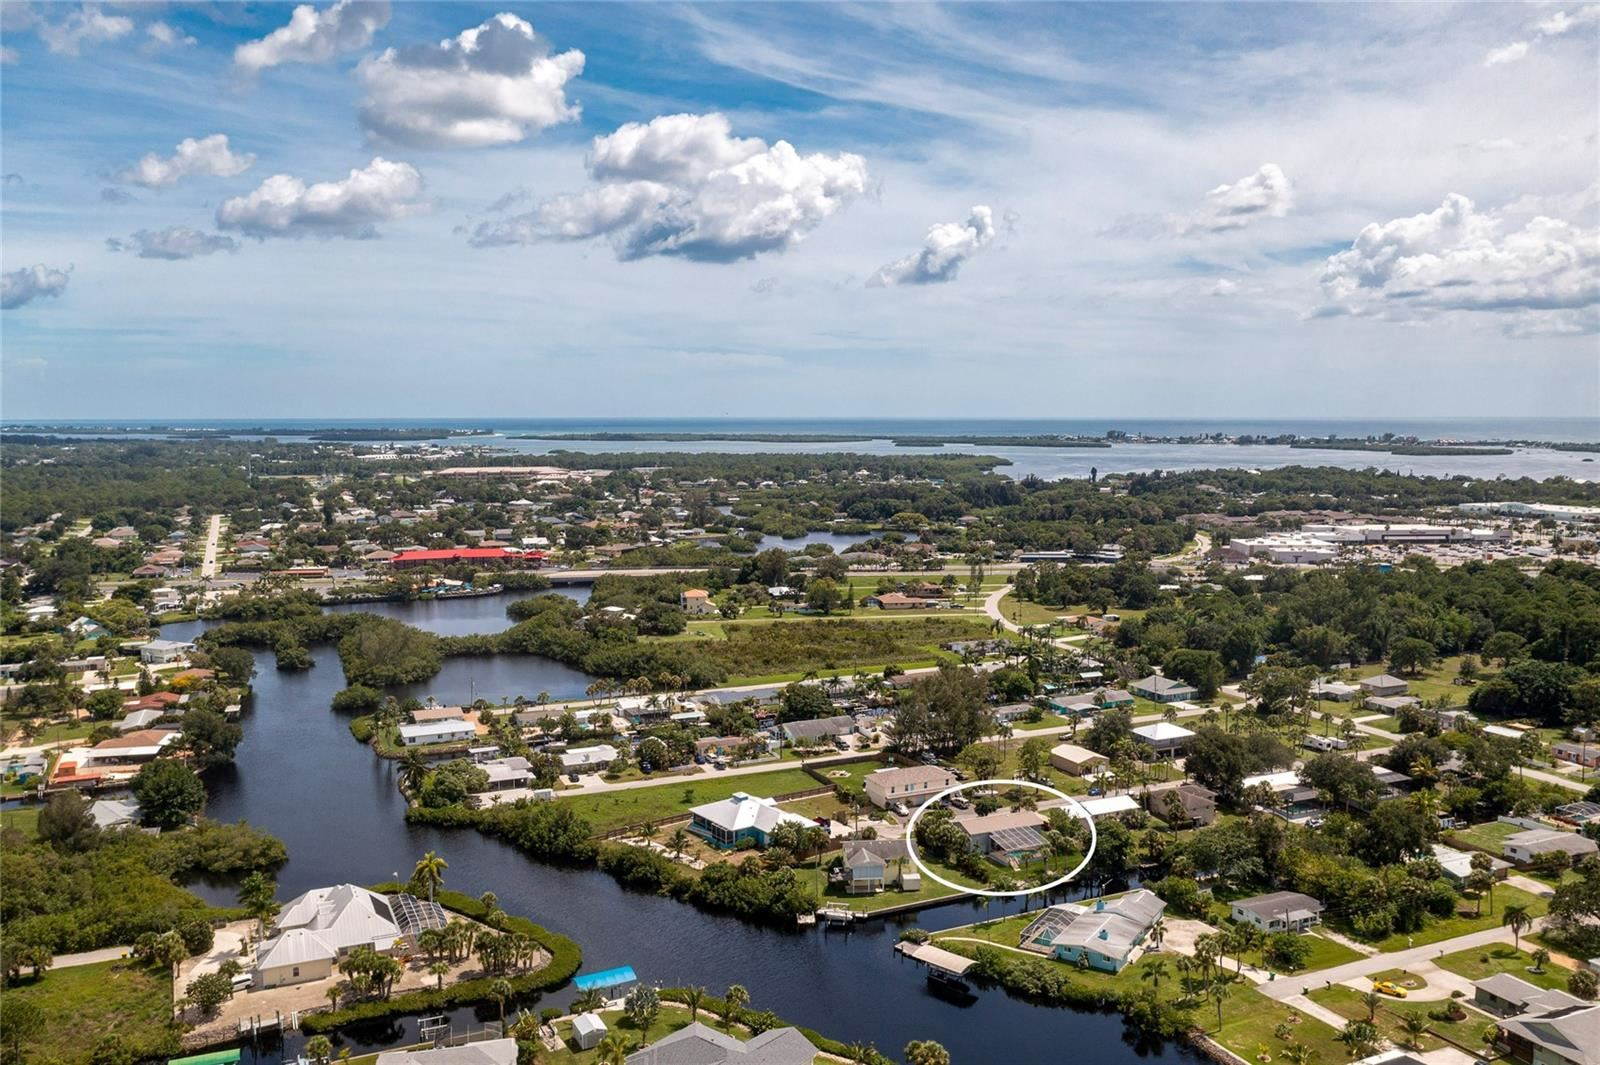 Photo of 6 COVE LANE, ENGLEWOOD, FL 34223 (MLS # D6120174)